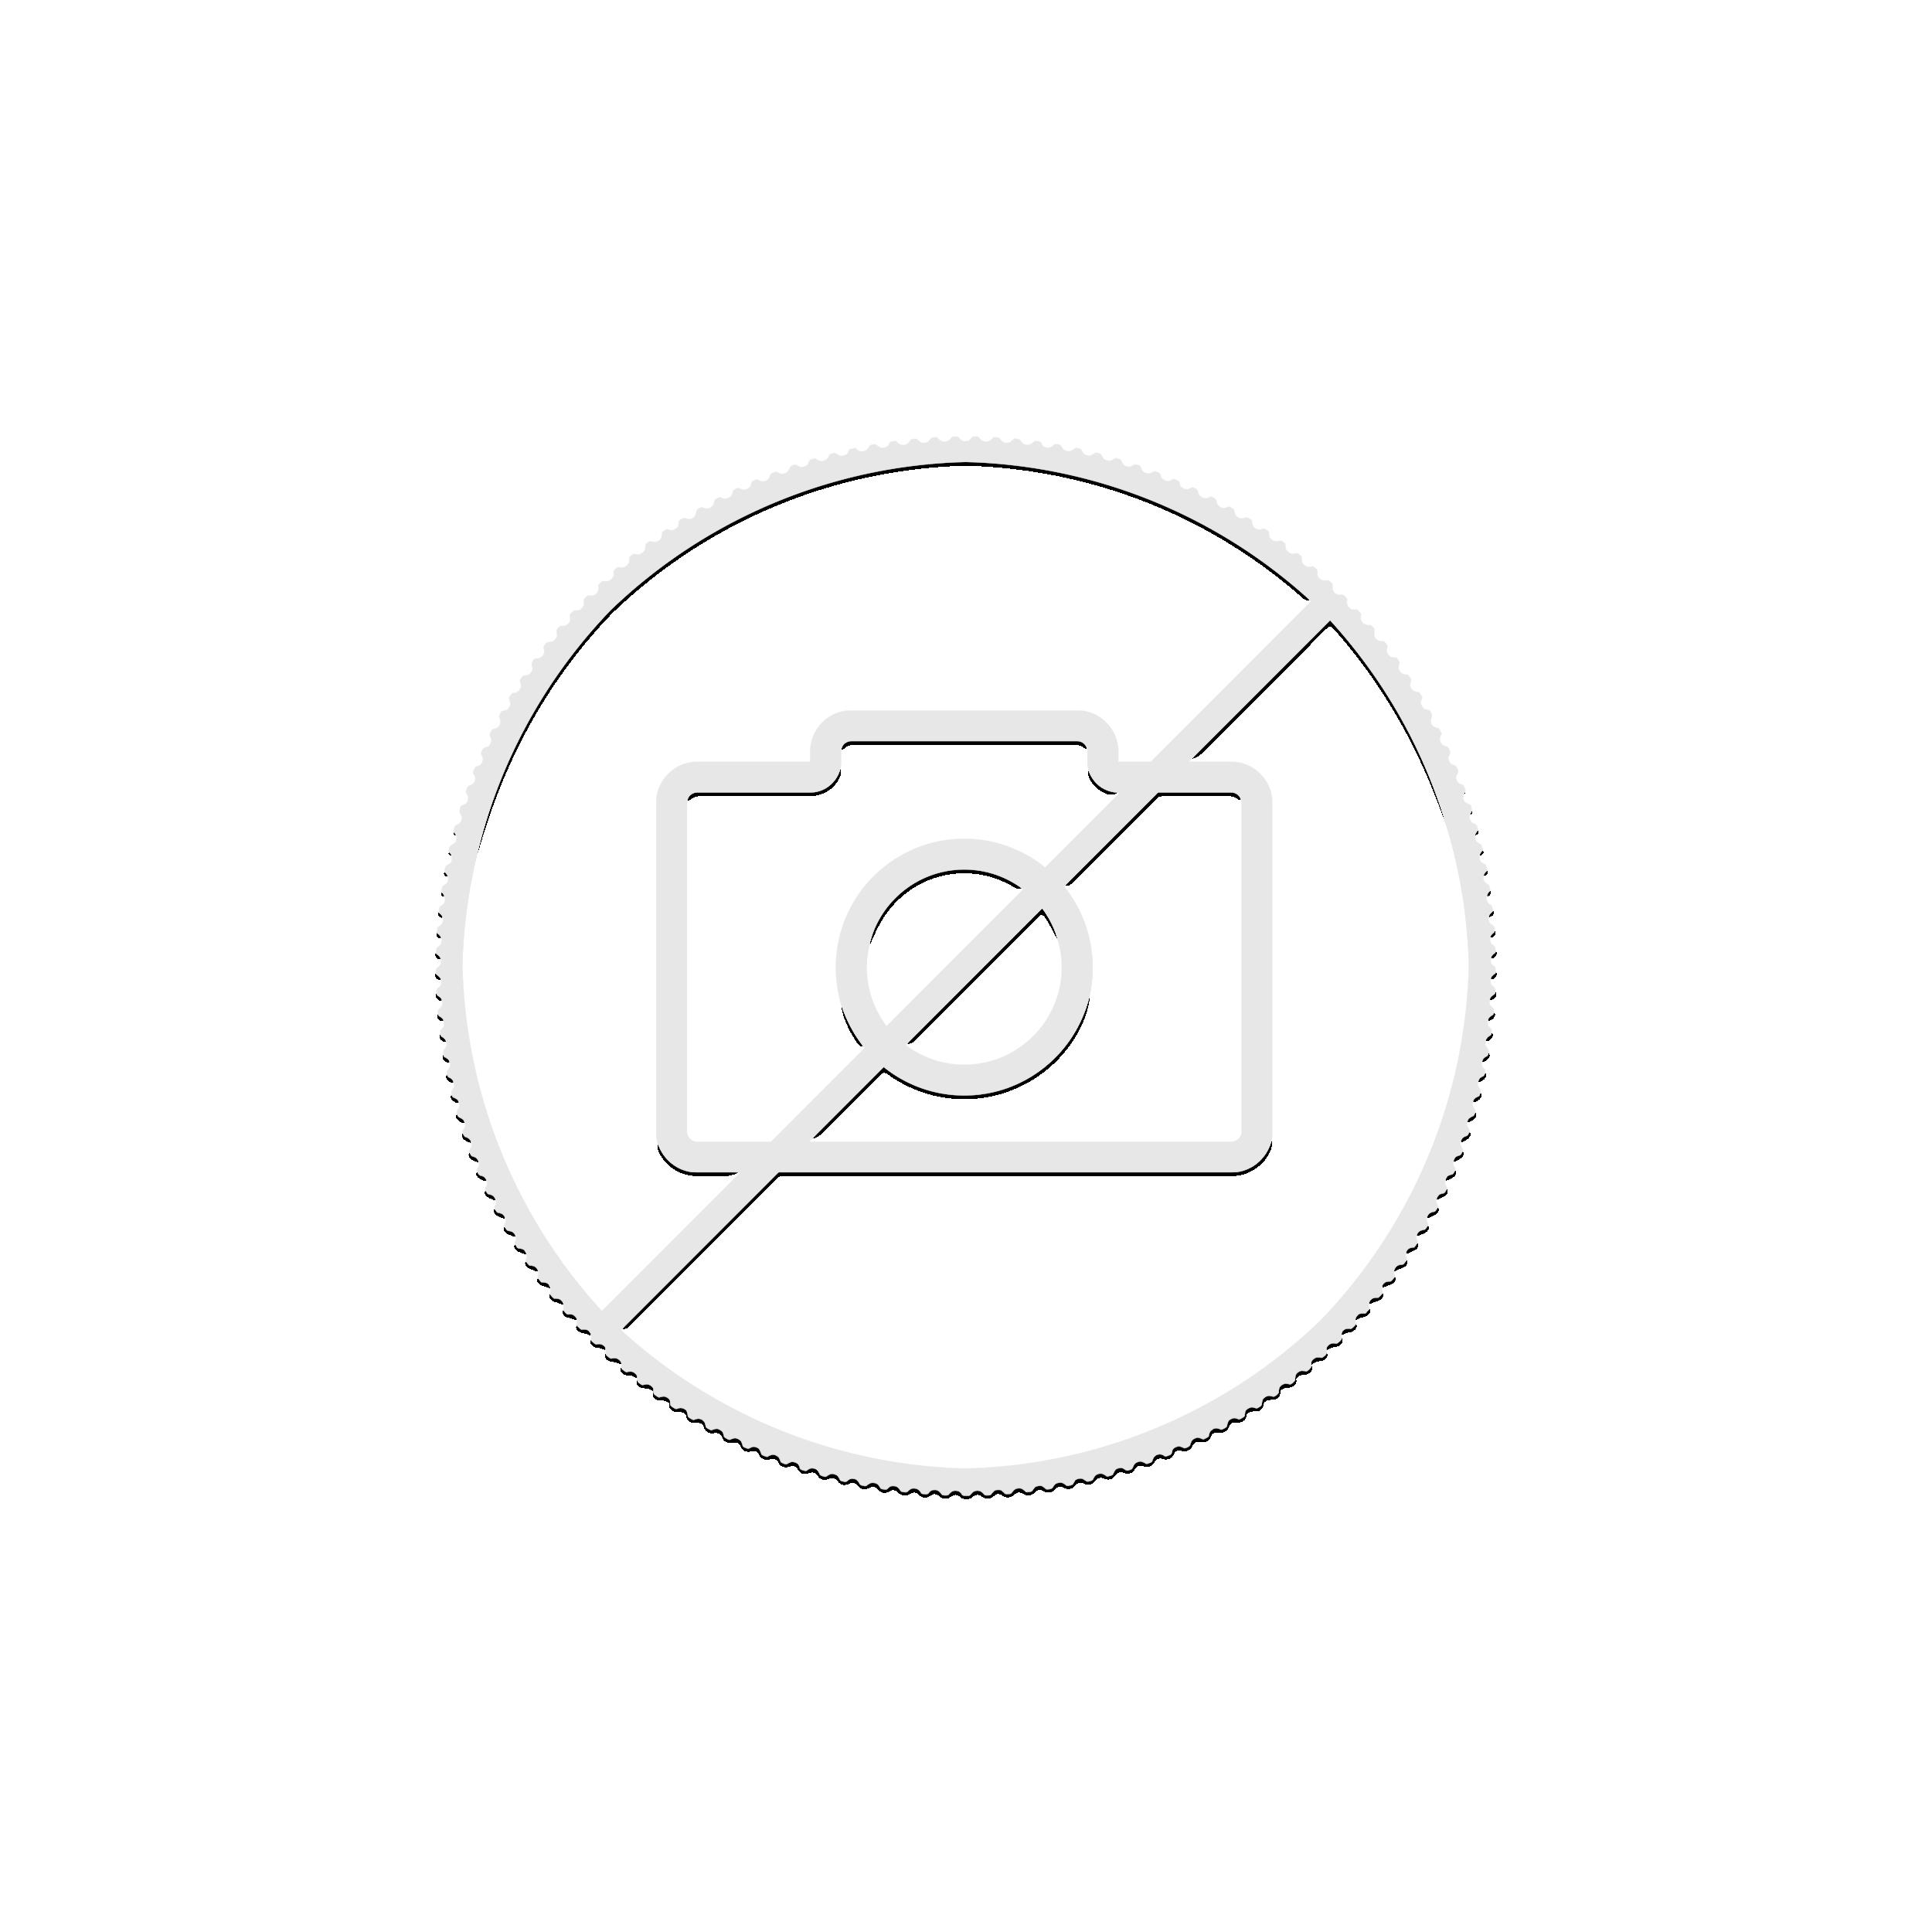 1 gram gold coin Maple Leaf